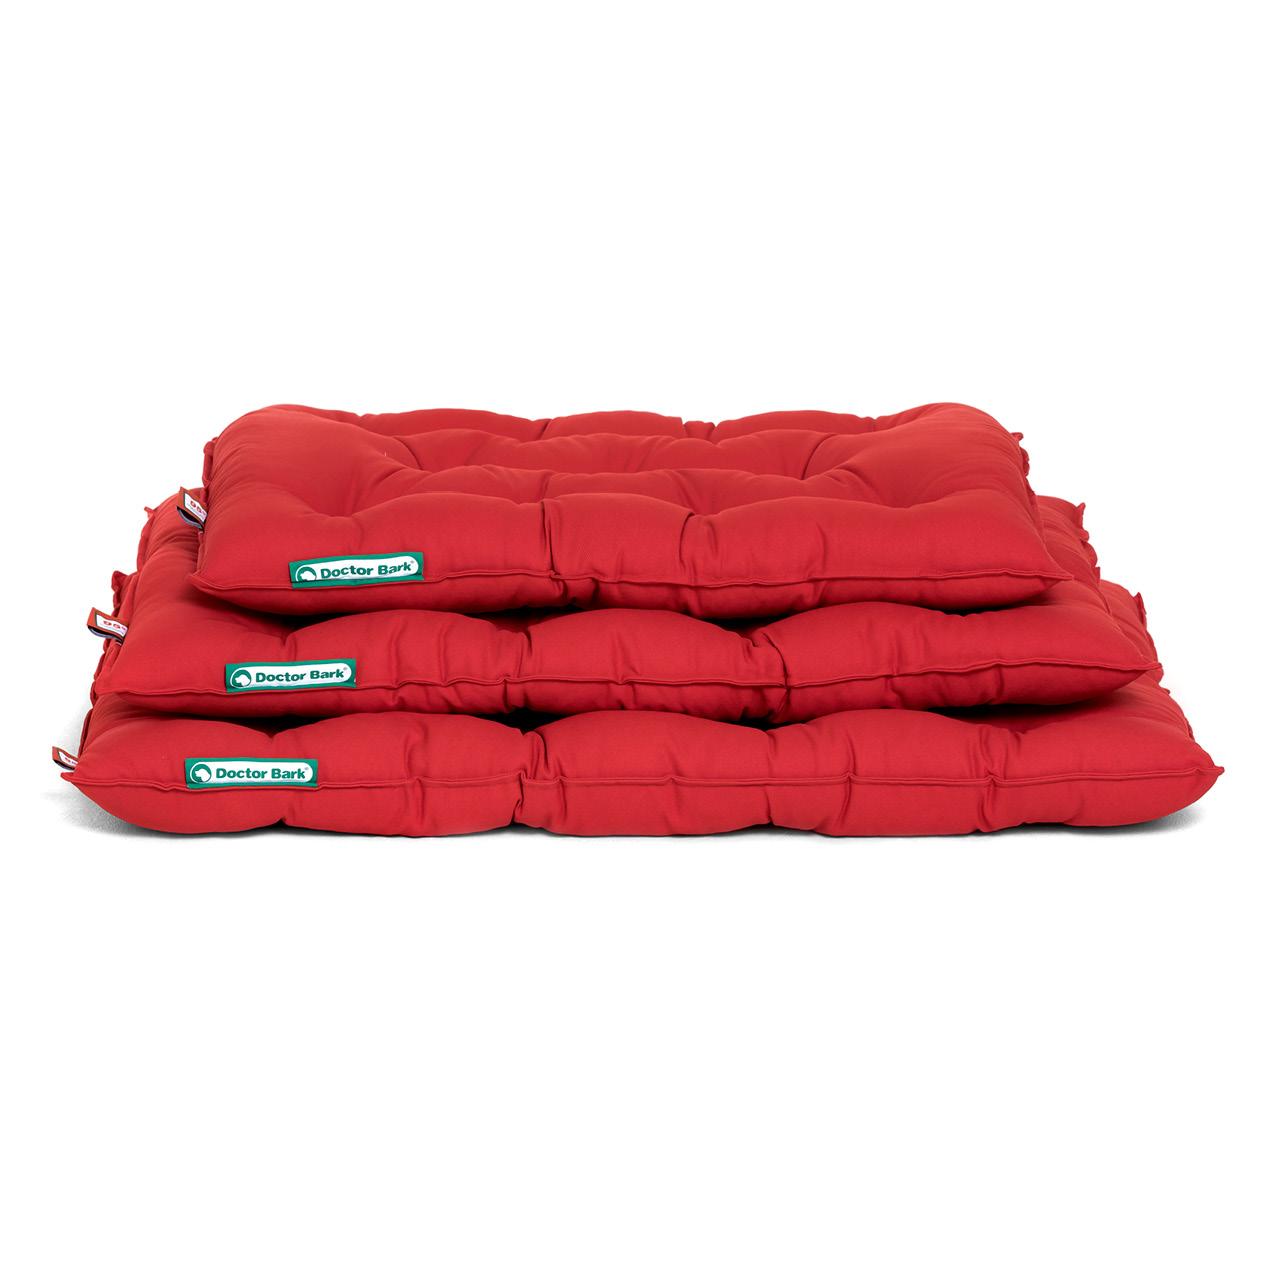 orthopädisches Einlegekissen für Doctor Bark Hundebett - tomate rot